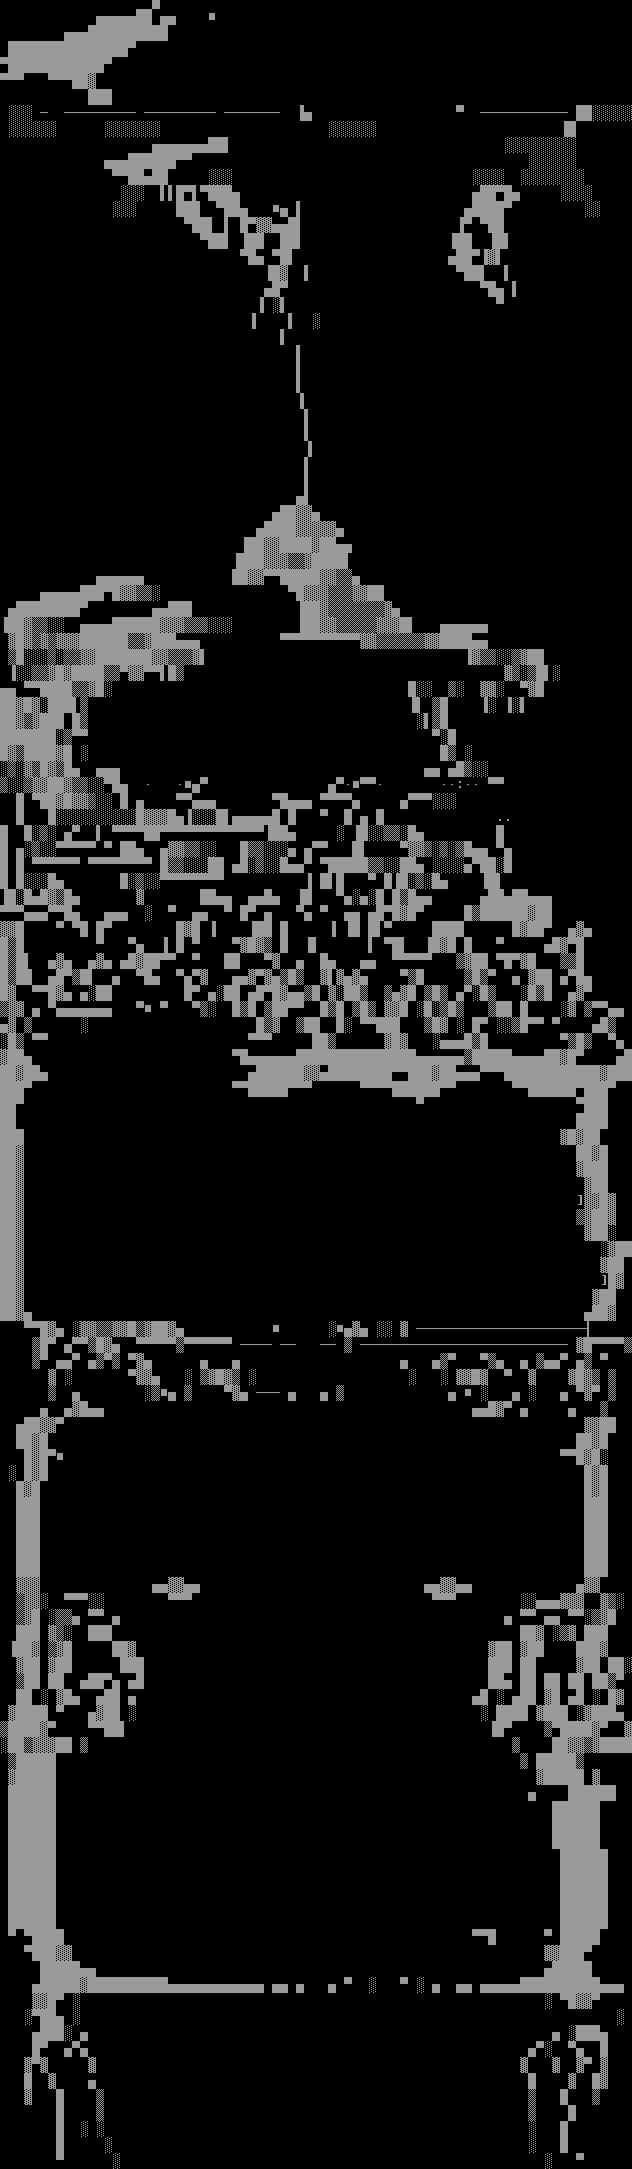 ascii neural network